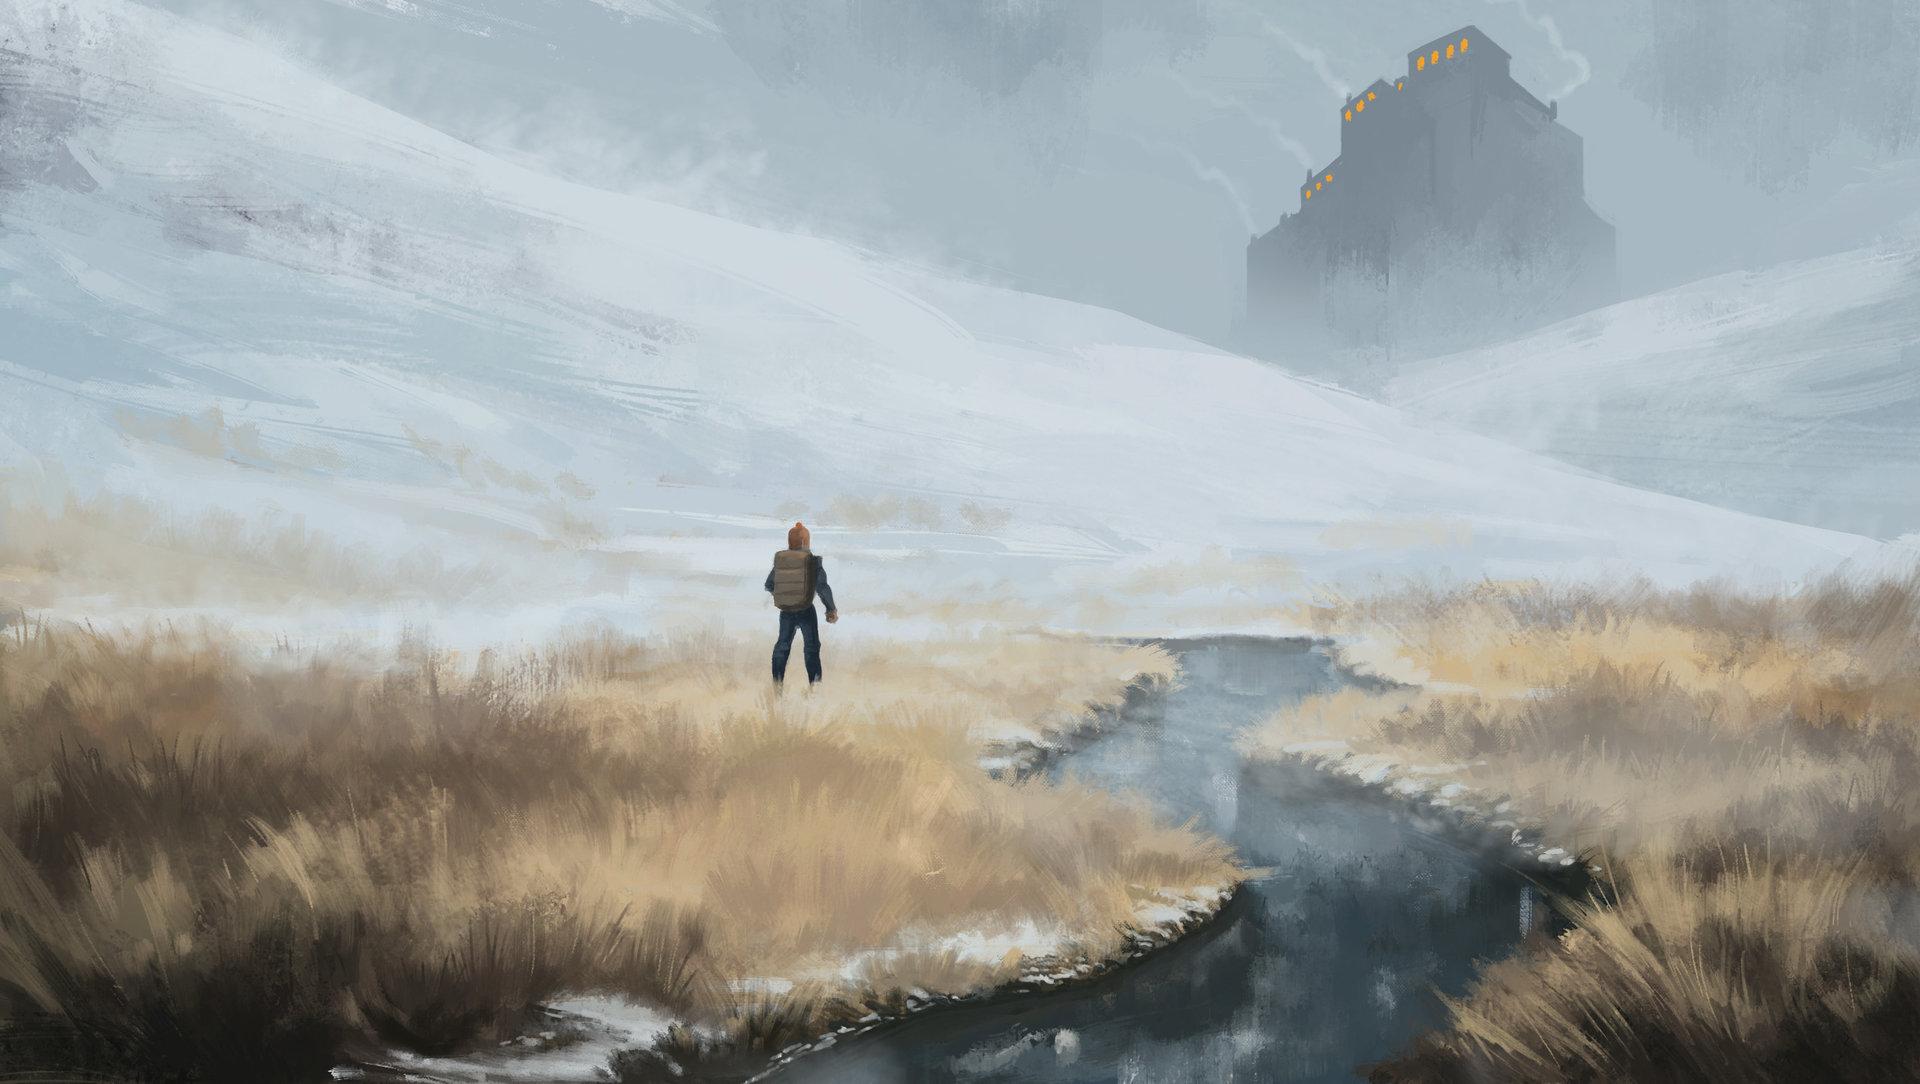 Concept art туман на полях и реке, персонаж, концепт арт от erel-maatita cold